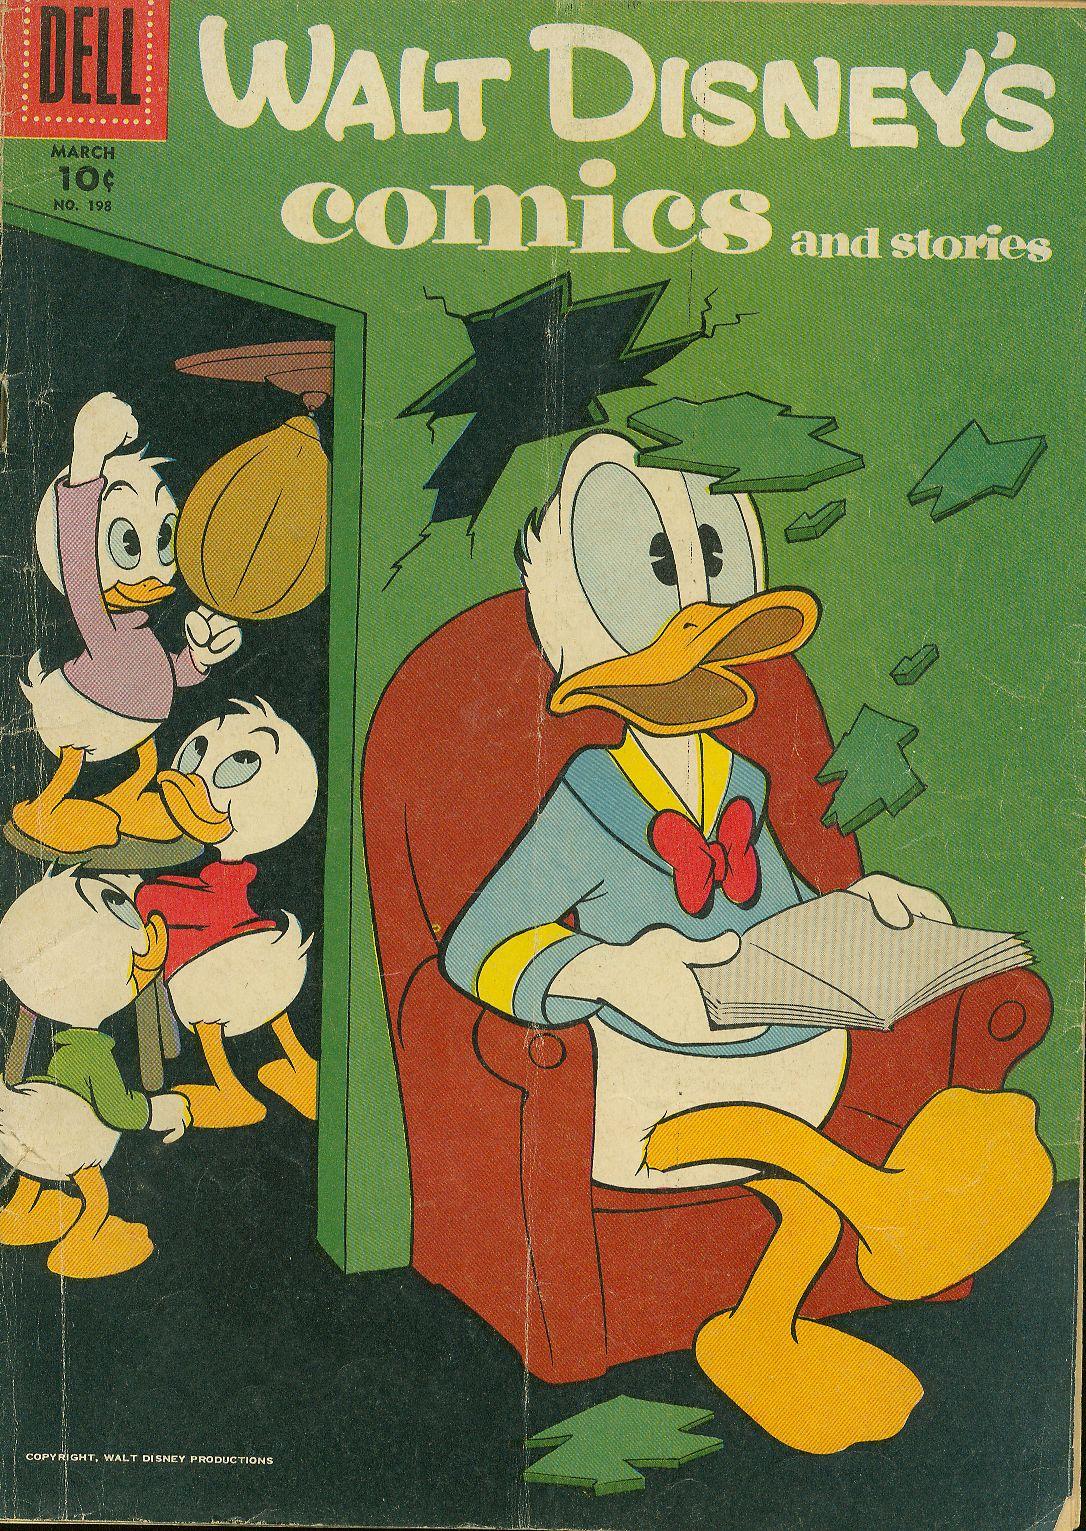 Walt Disneys Comics and Stories 198 Page 1